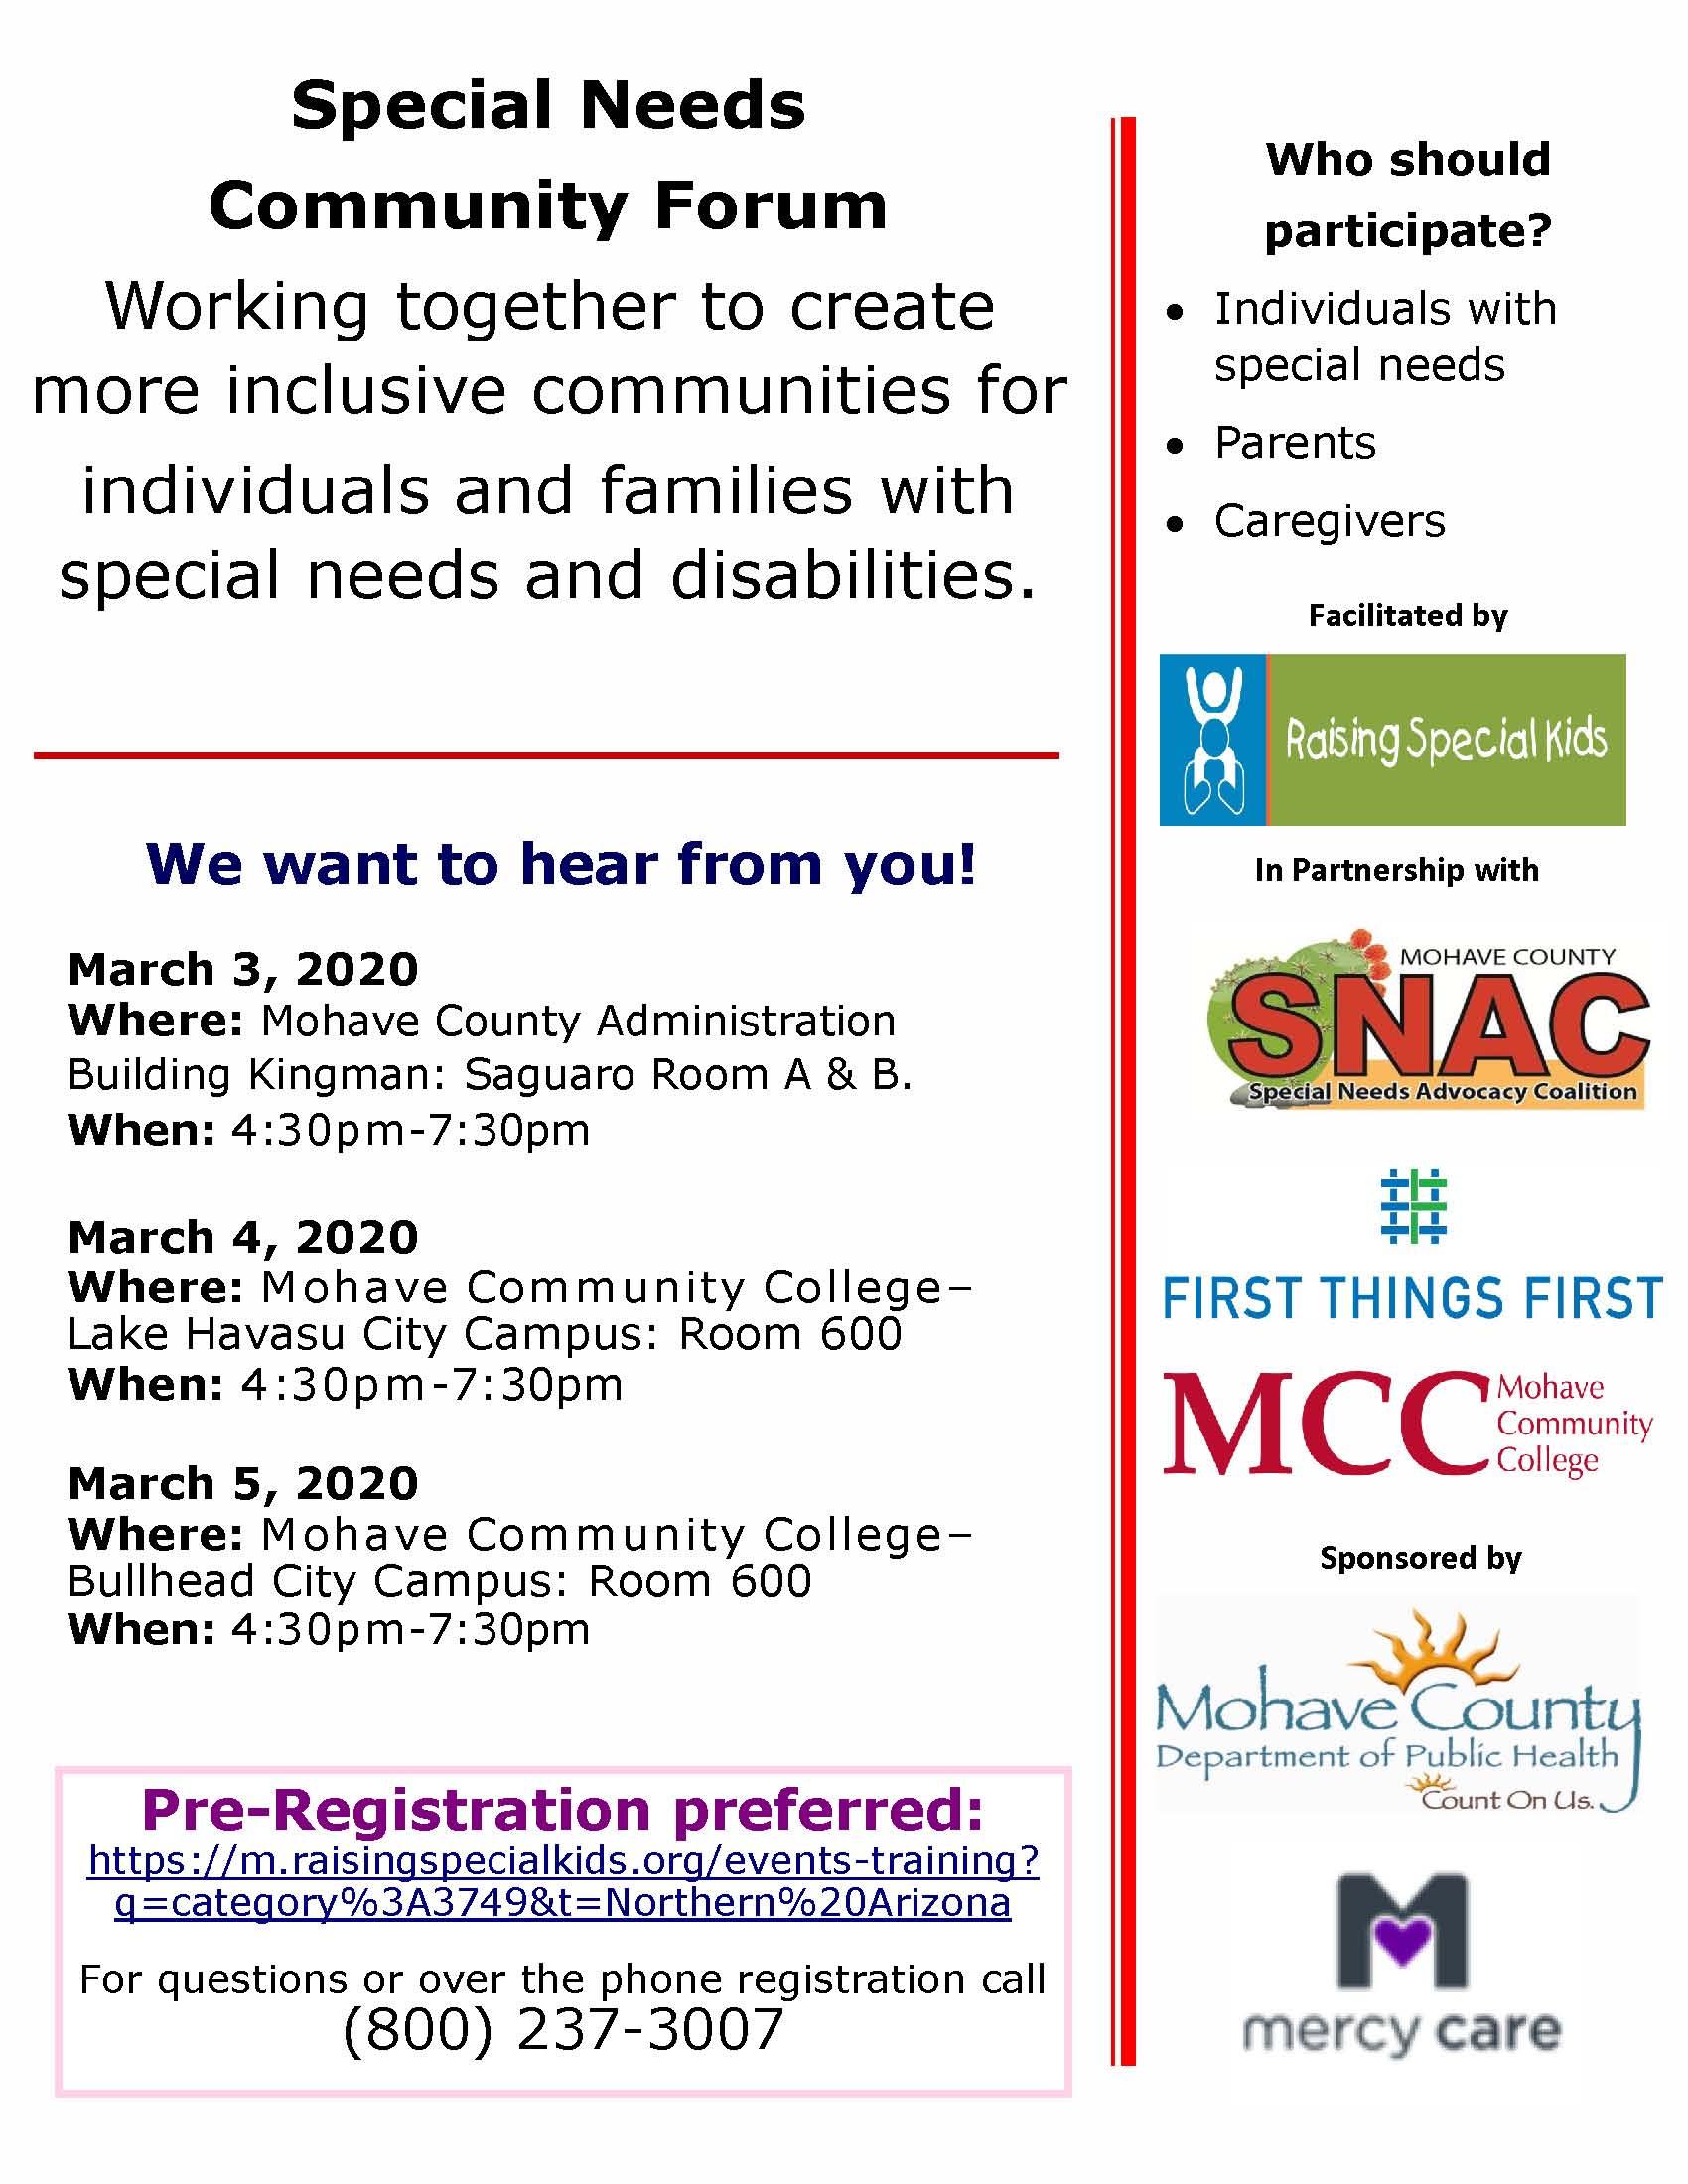 Special Needs Community Forum